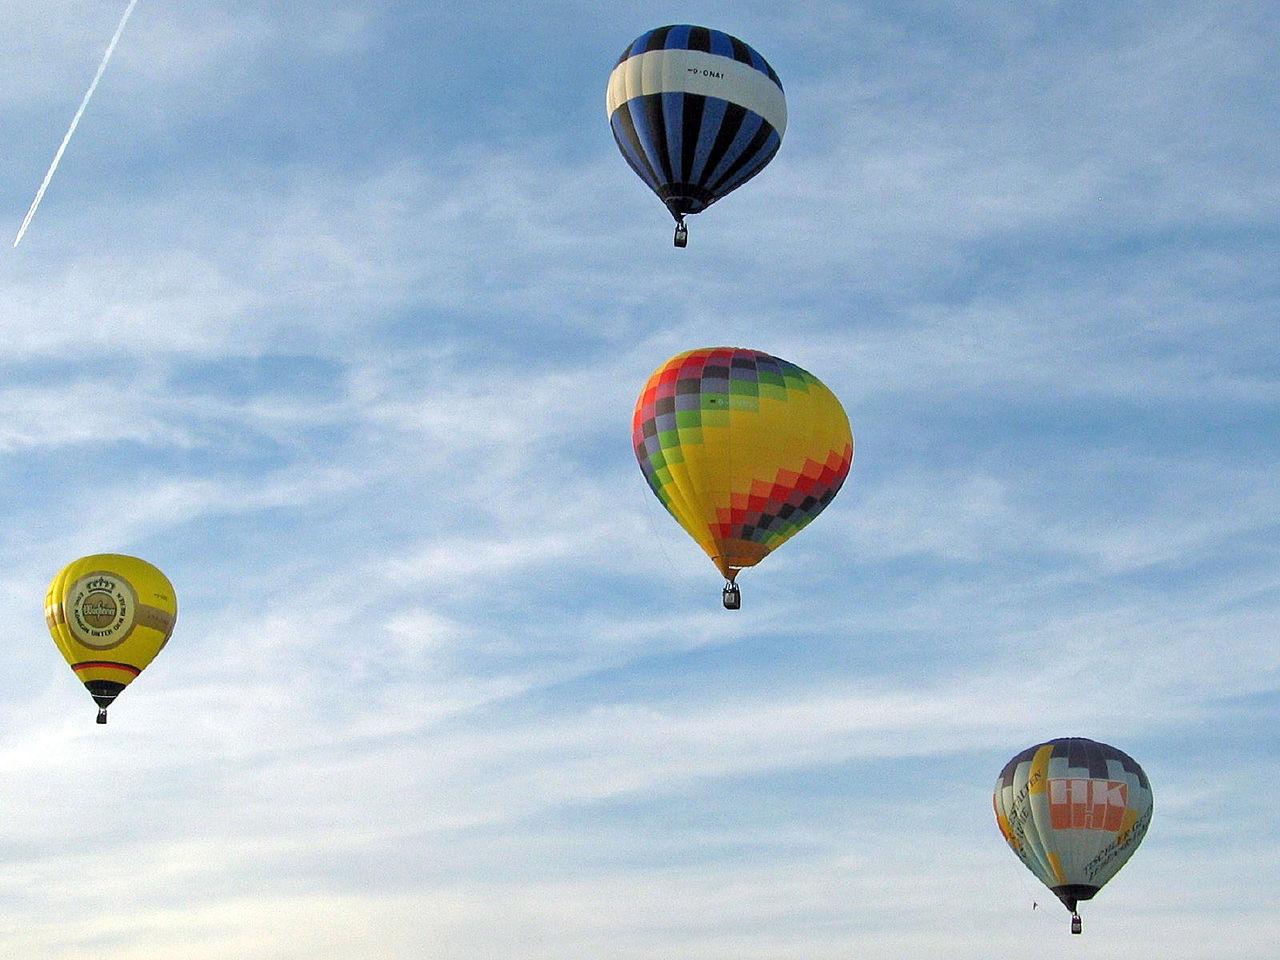 Bild Corolus Ballon Fahrt Ingelheim